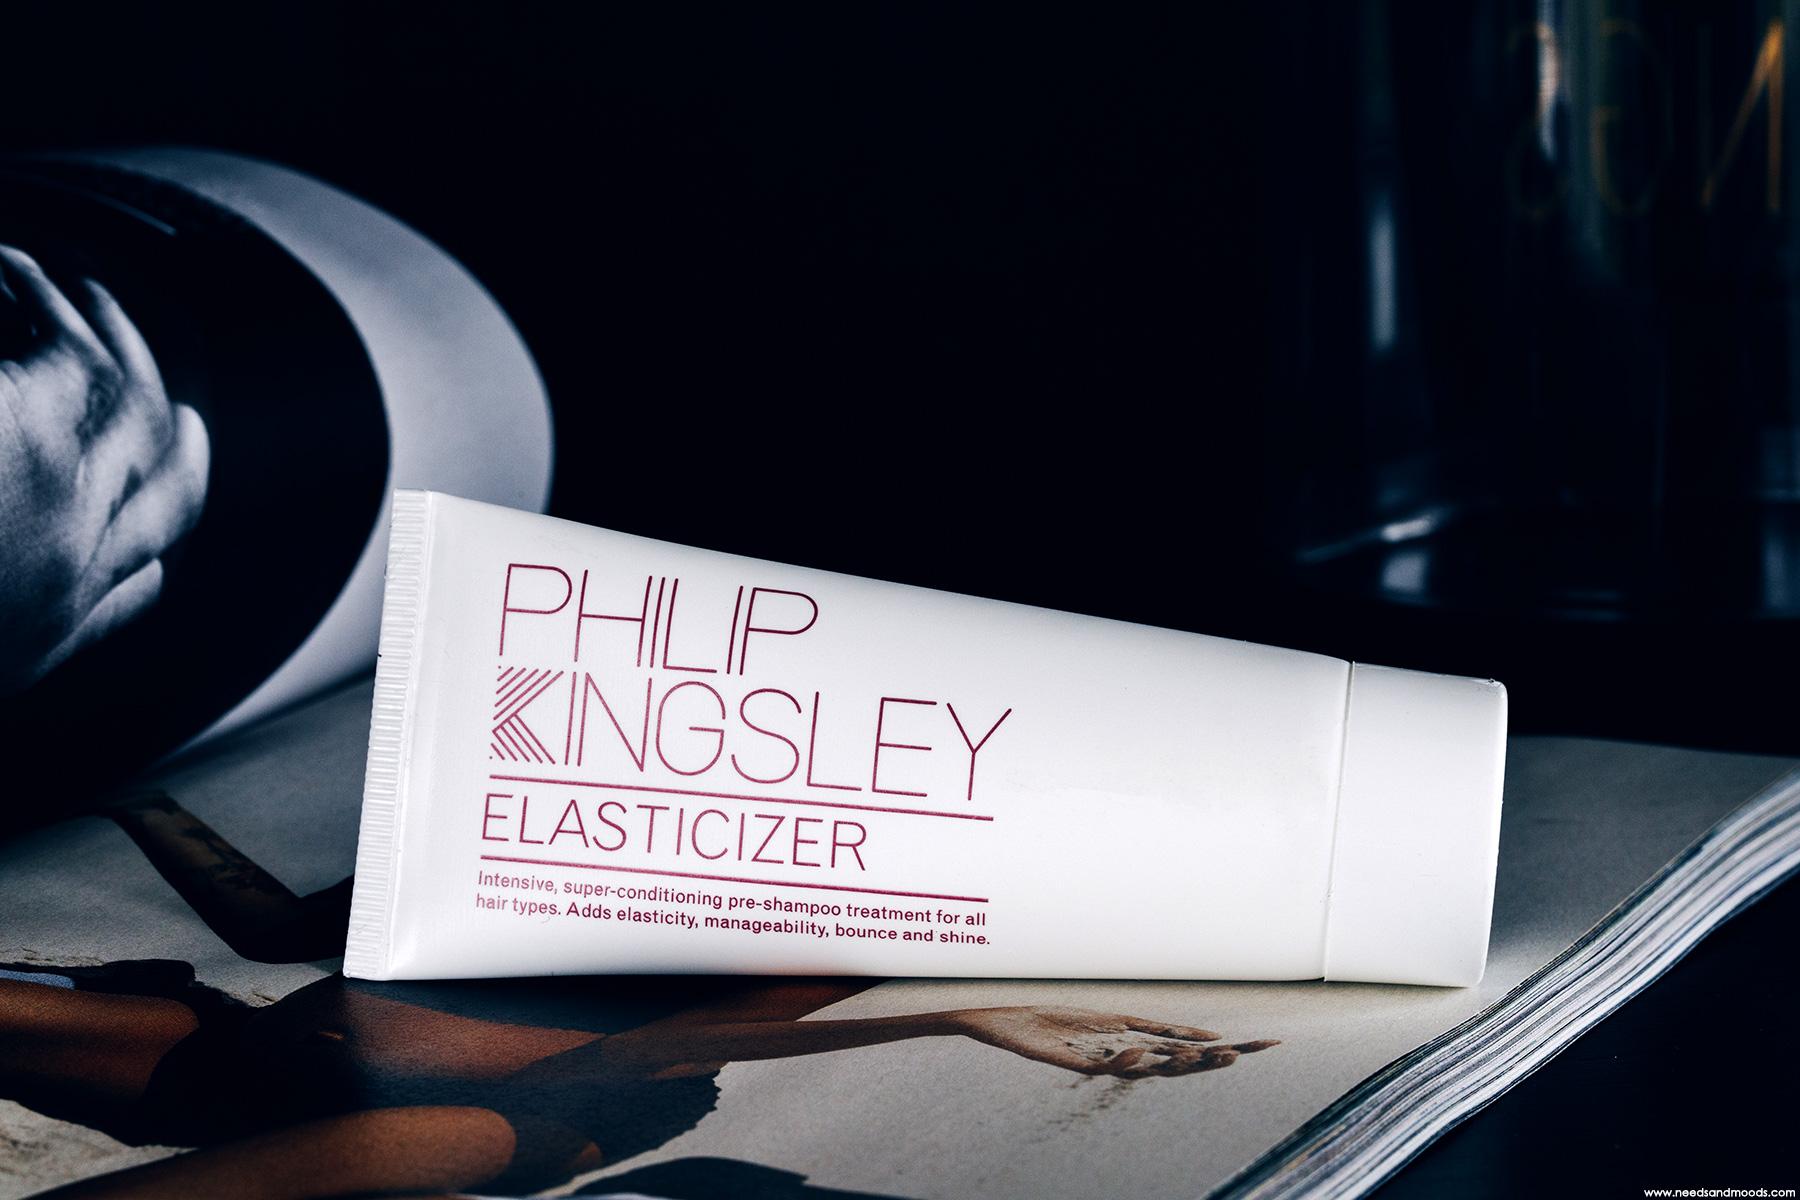 lookfantastic box septembre 2018 philip kingsley